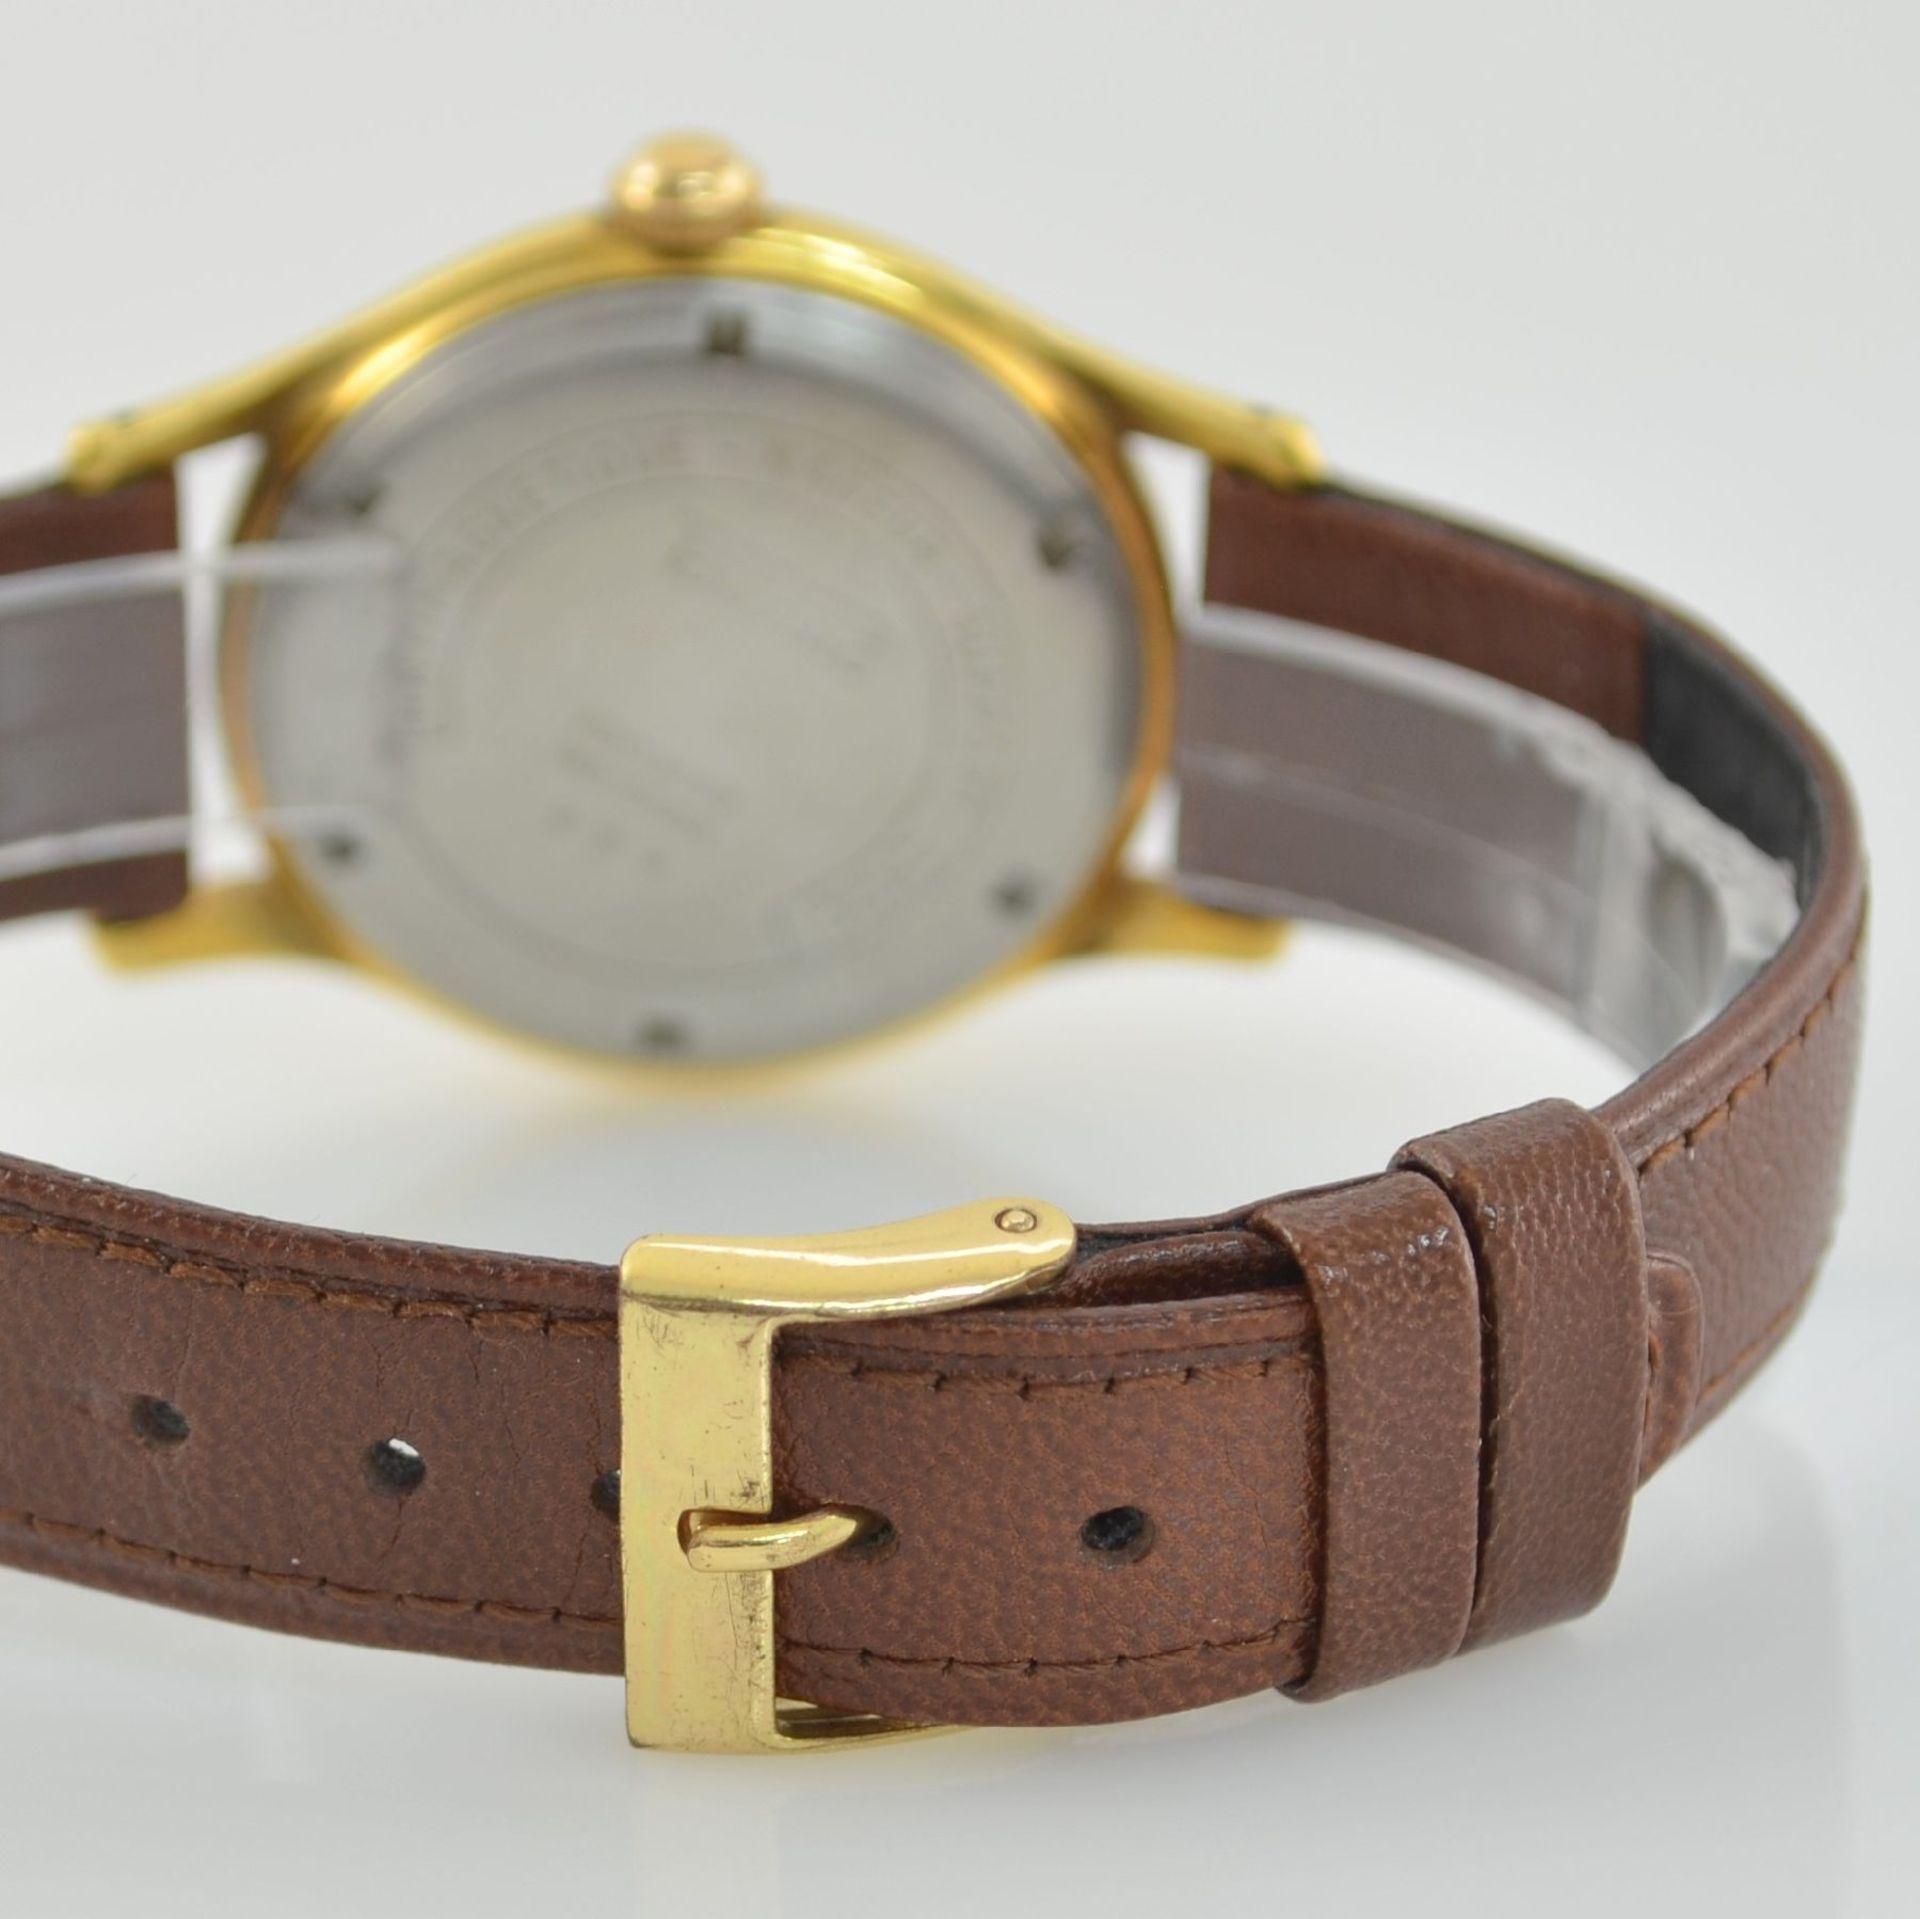 Konvolut: 2 Armbanduhren mit Kalender bzw. Datum, Schweiz um 1950-1960, Handaufzug, 1) NACAR m. - Bild 11 aus 12